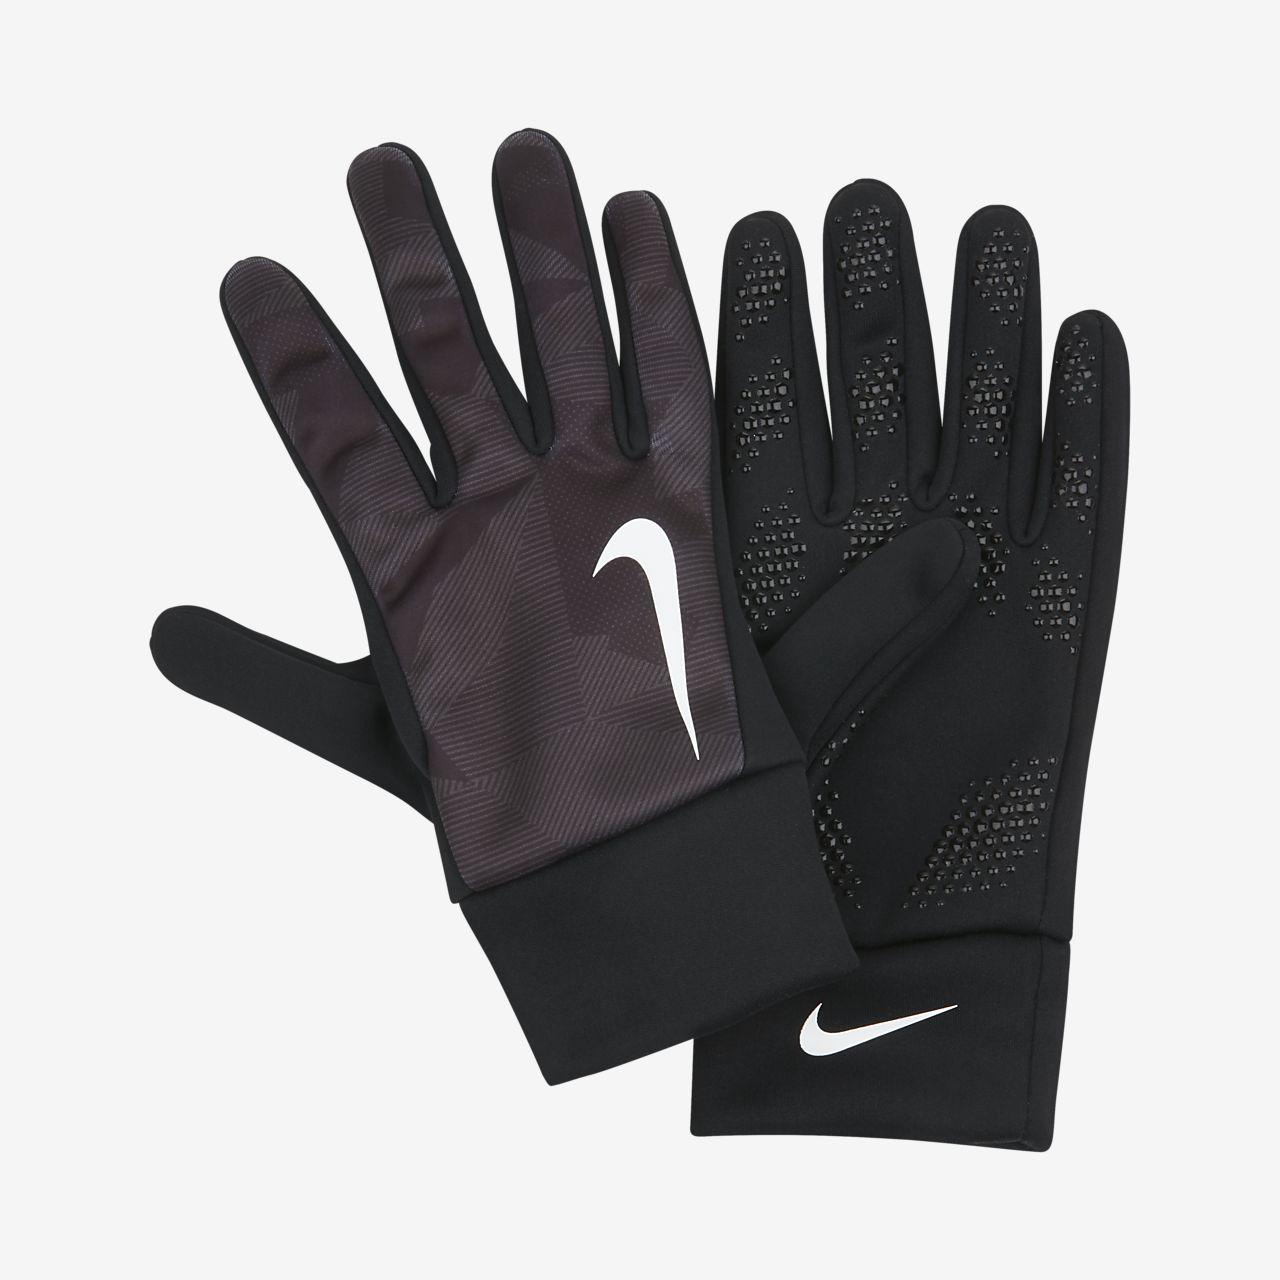 Nike HyperWarm Field Player Football Gloves